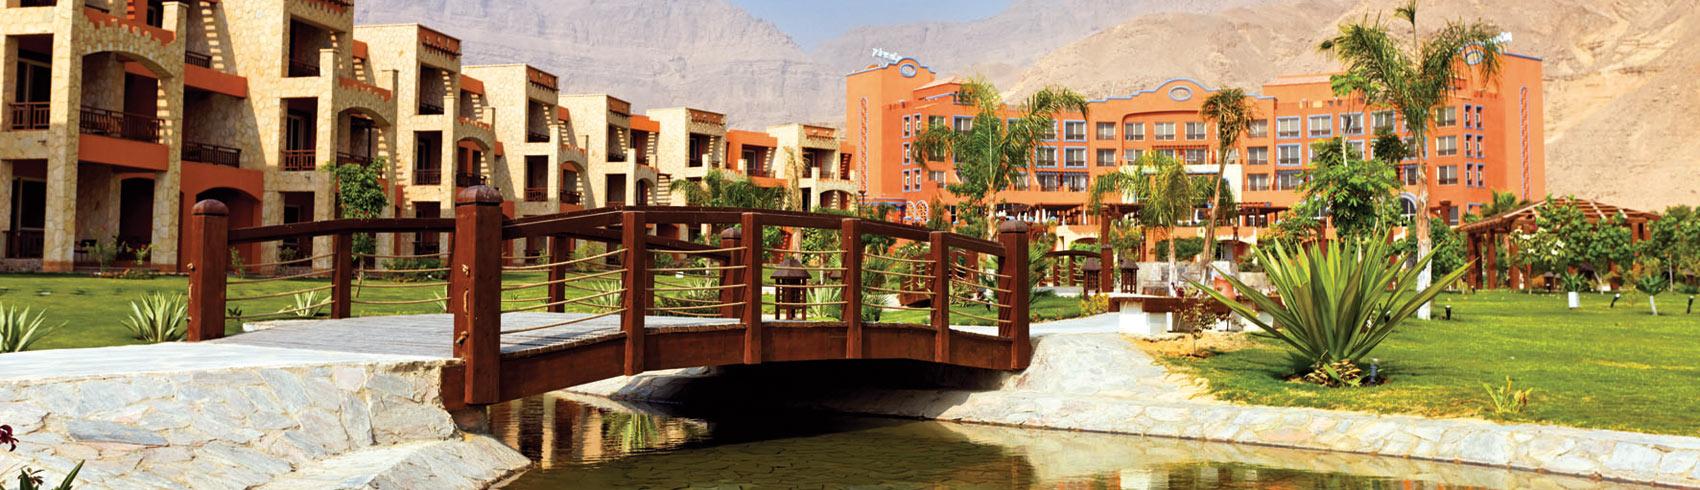 Mövenpick Resort El Sokhna image4